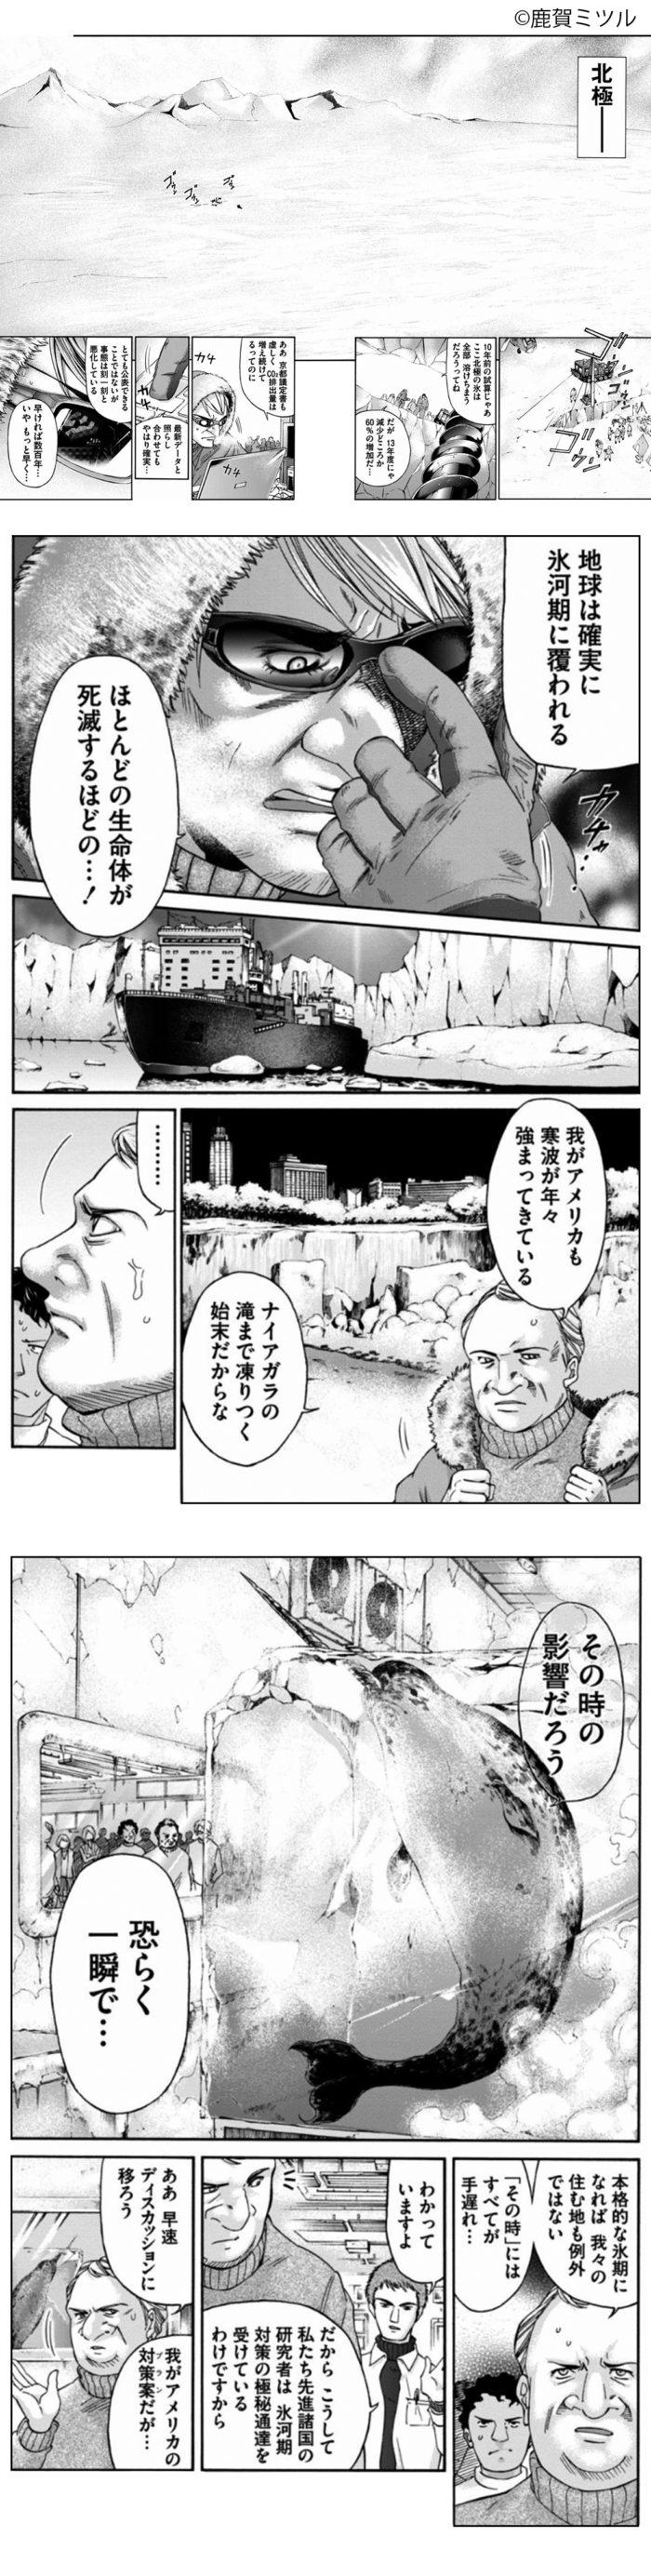 tyouzinnrui1-2-1